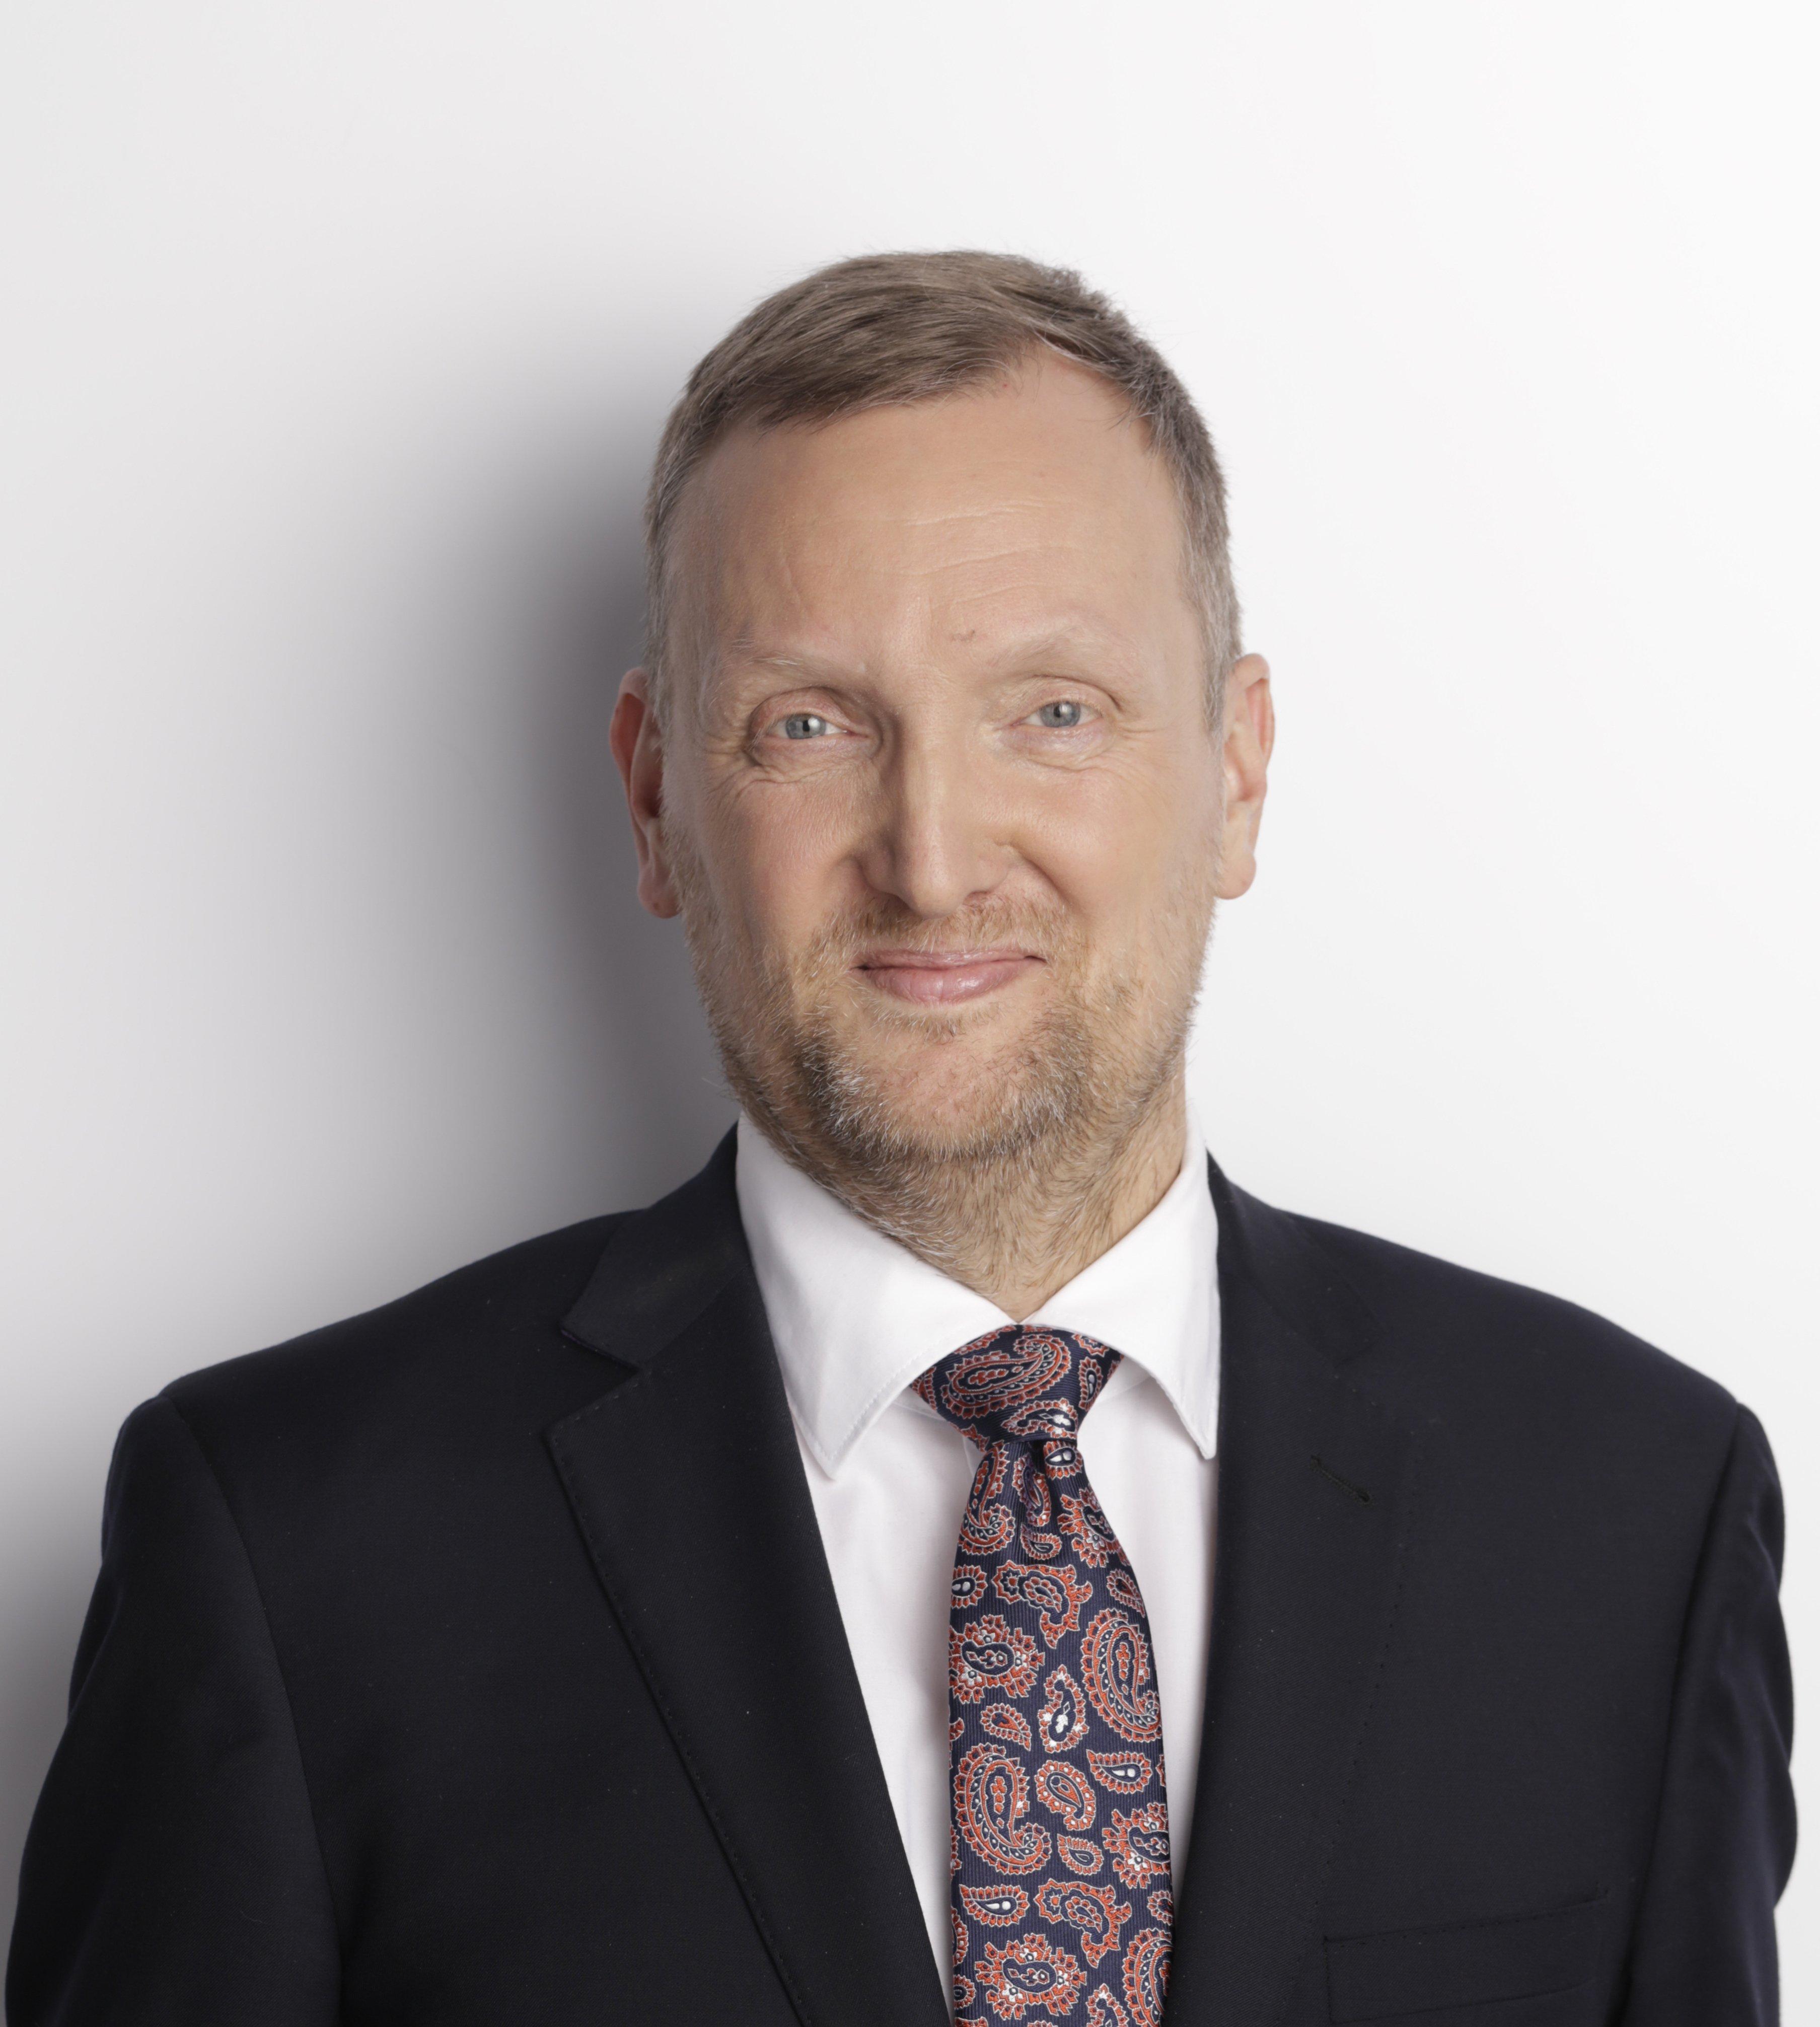 Professor Doktor Christian Bernzen